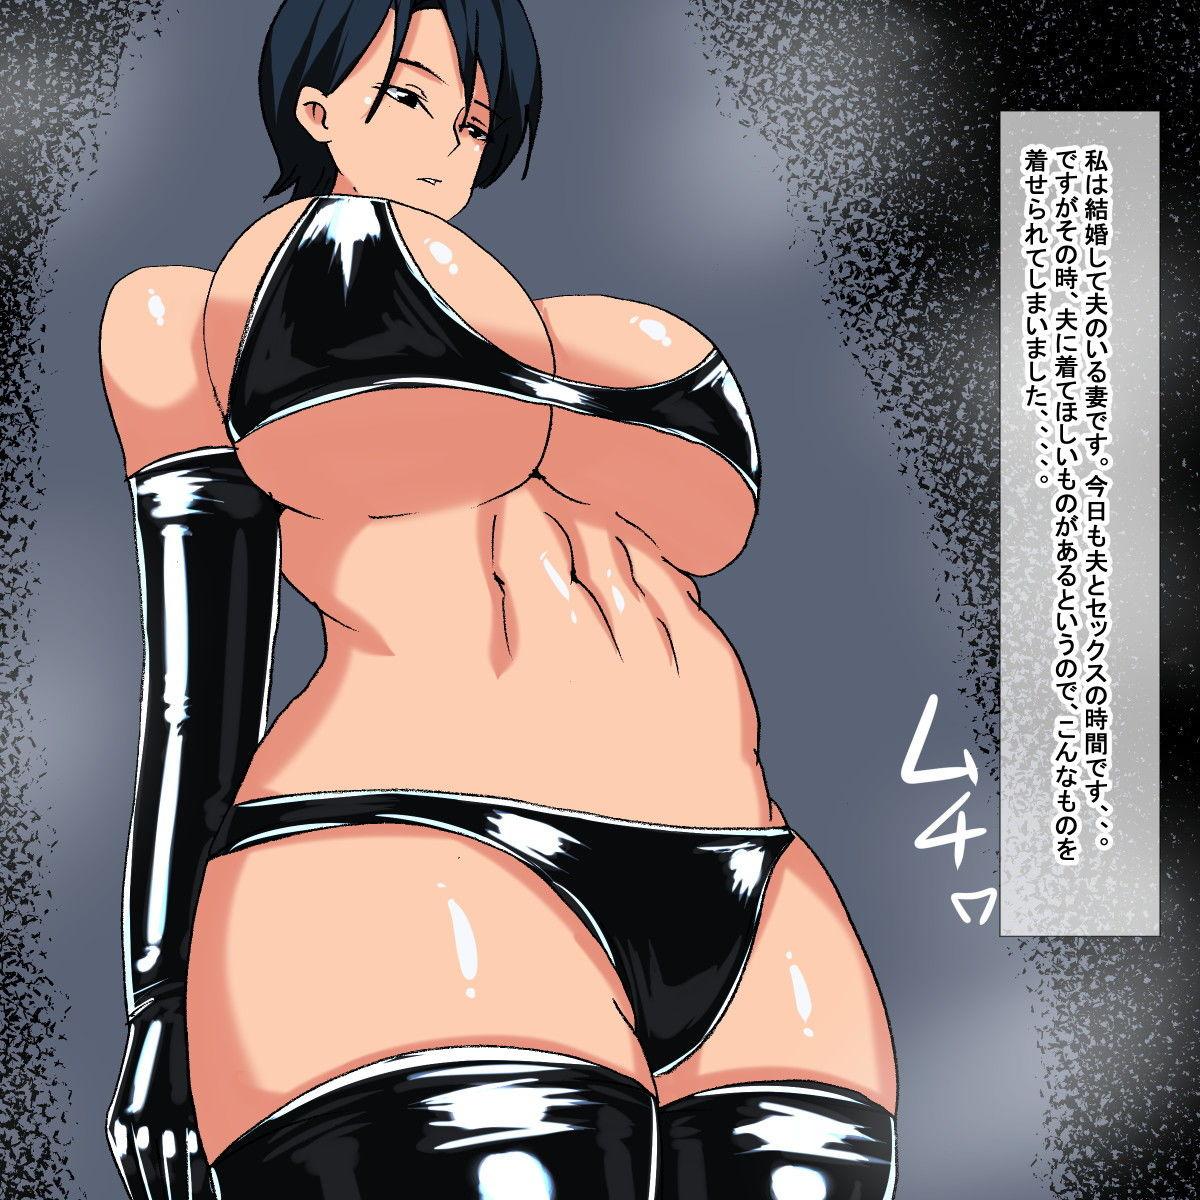 nq ビキニ風ボディスーツ妻 エロ画像